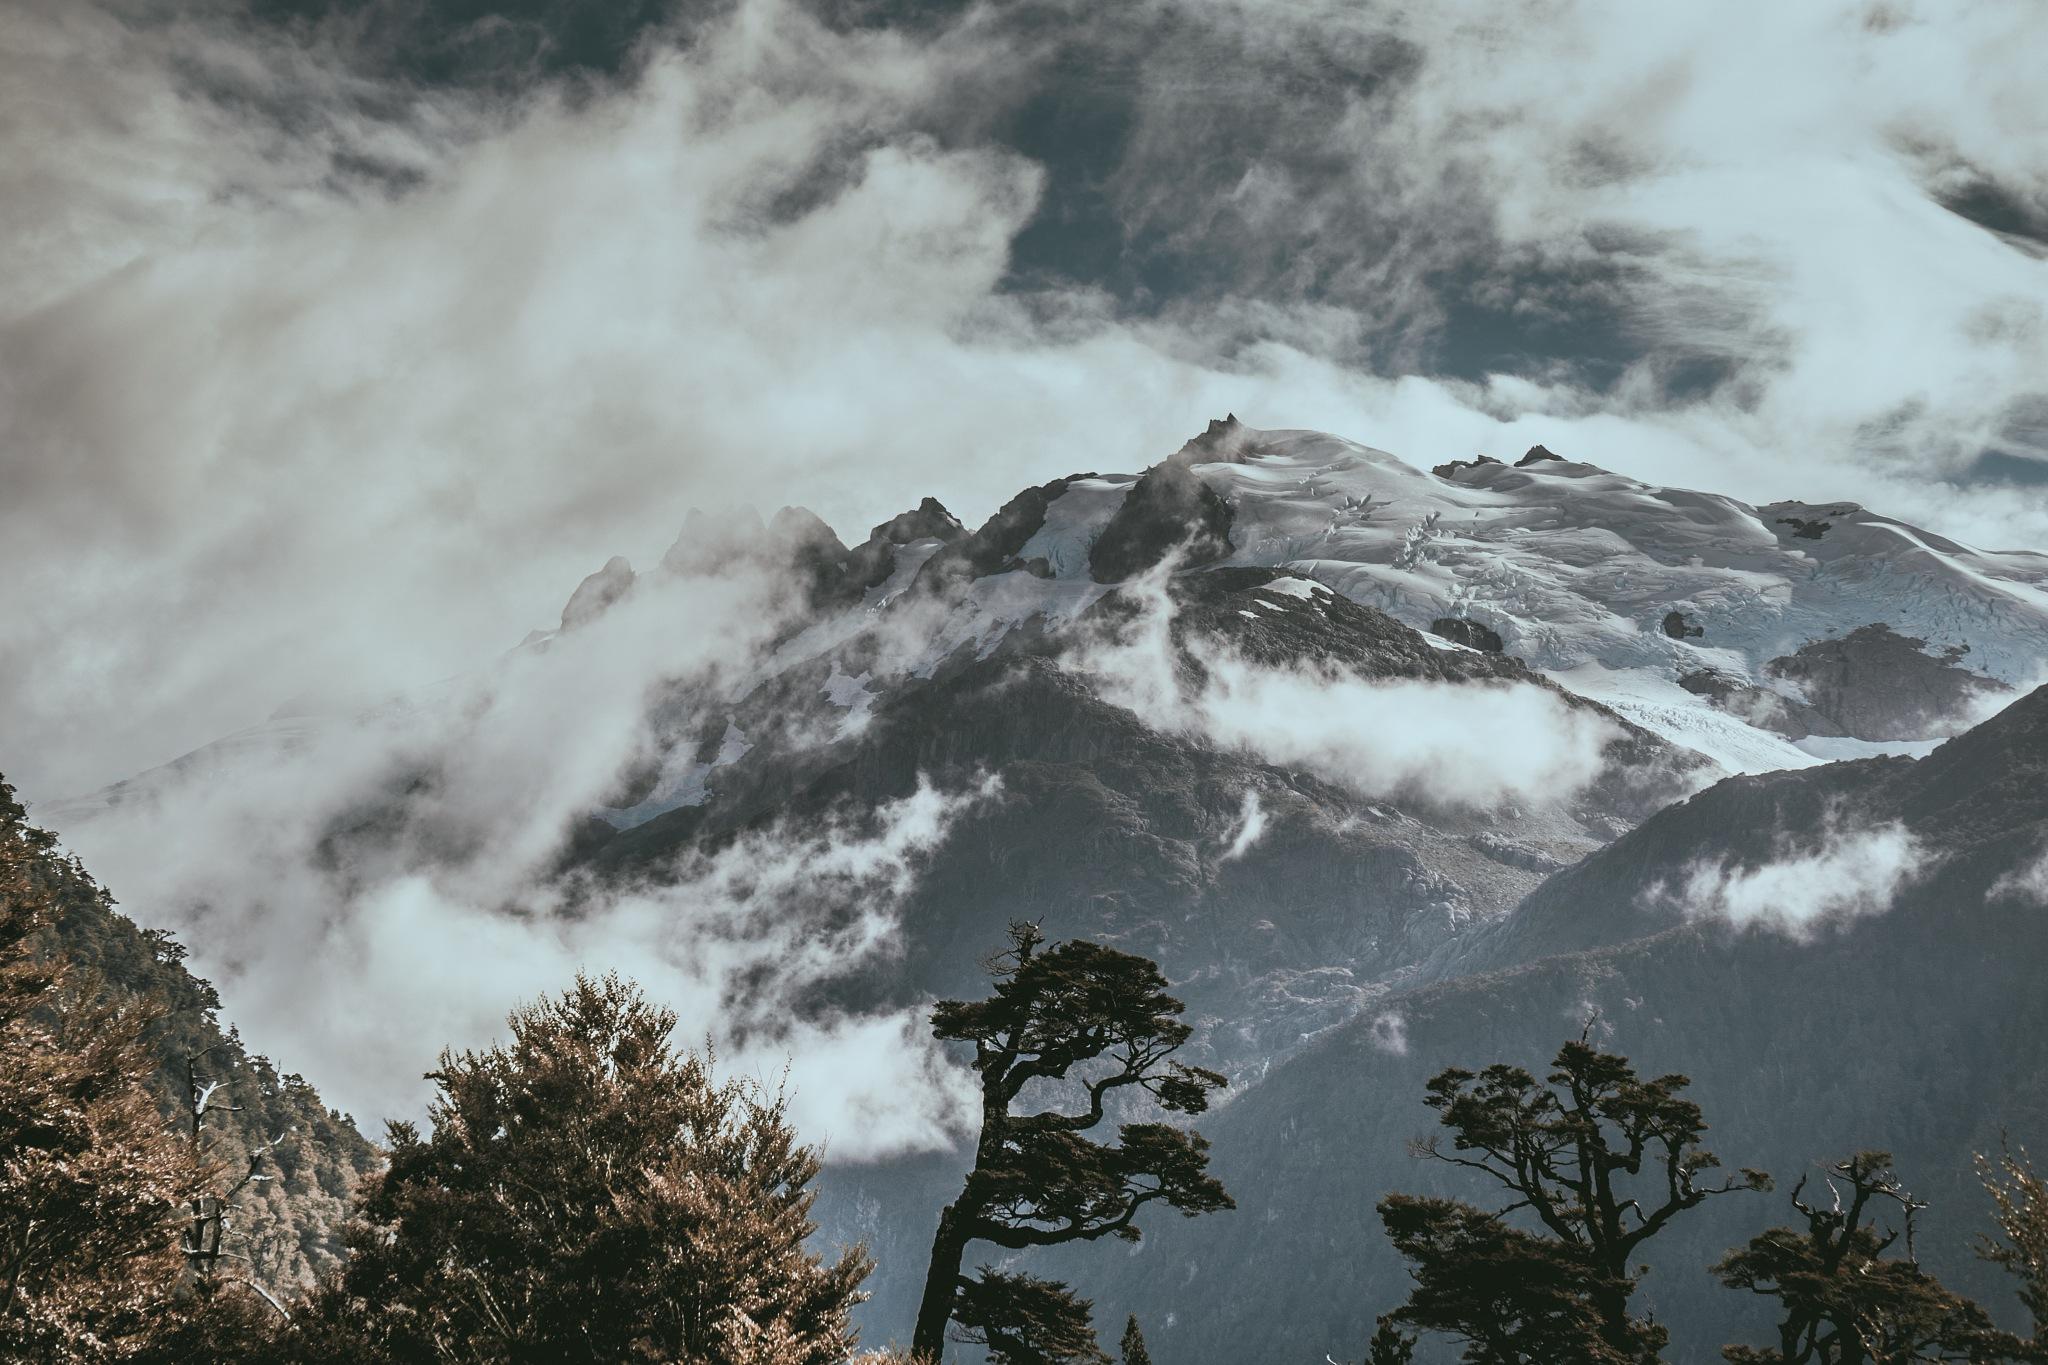 Patagonia Winter by Manuel Fuentes